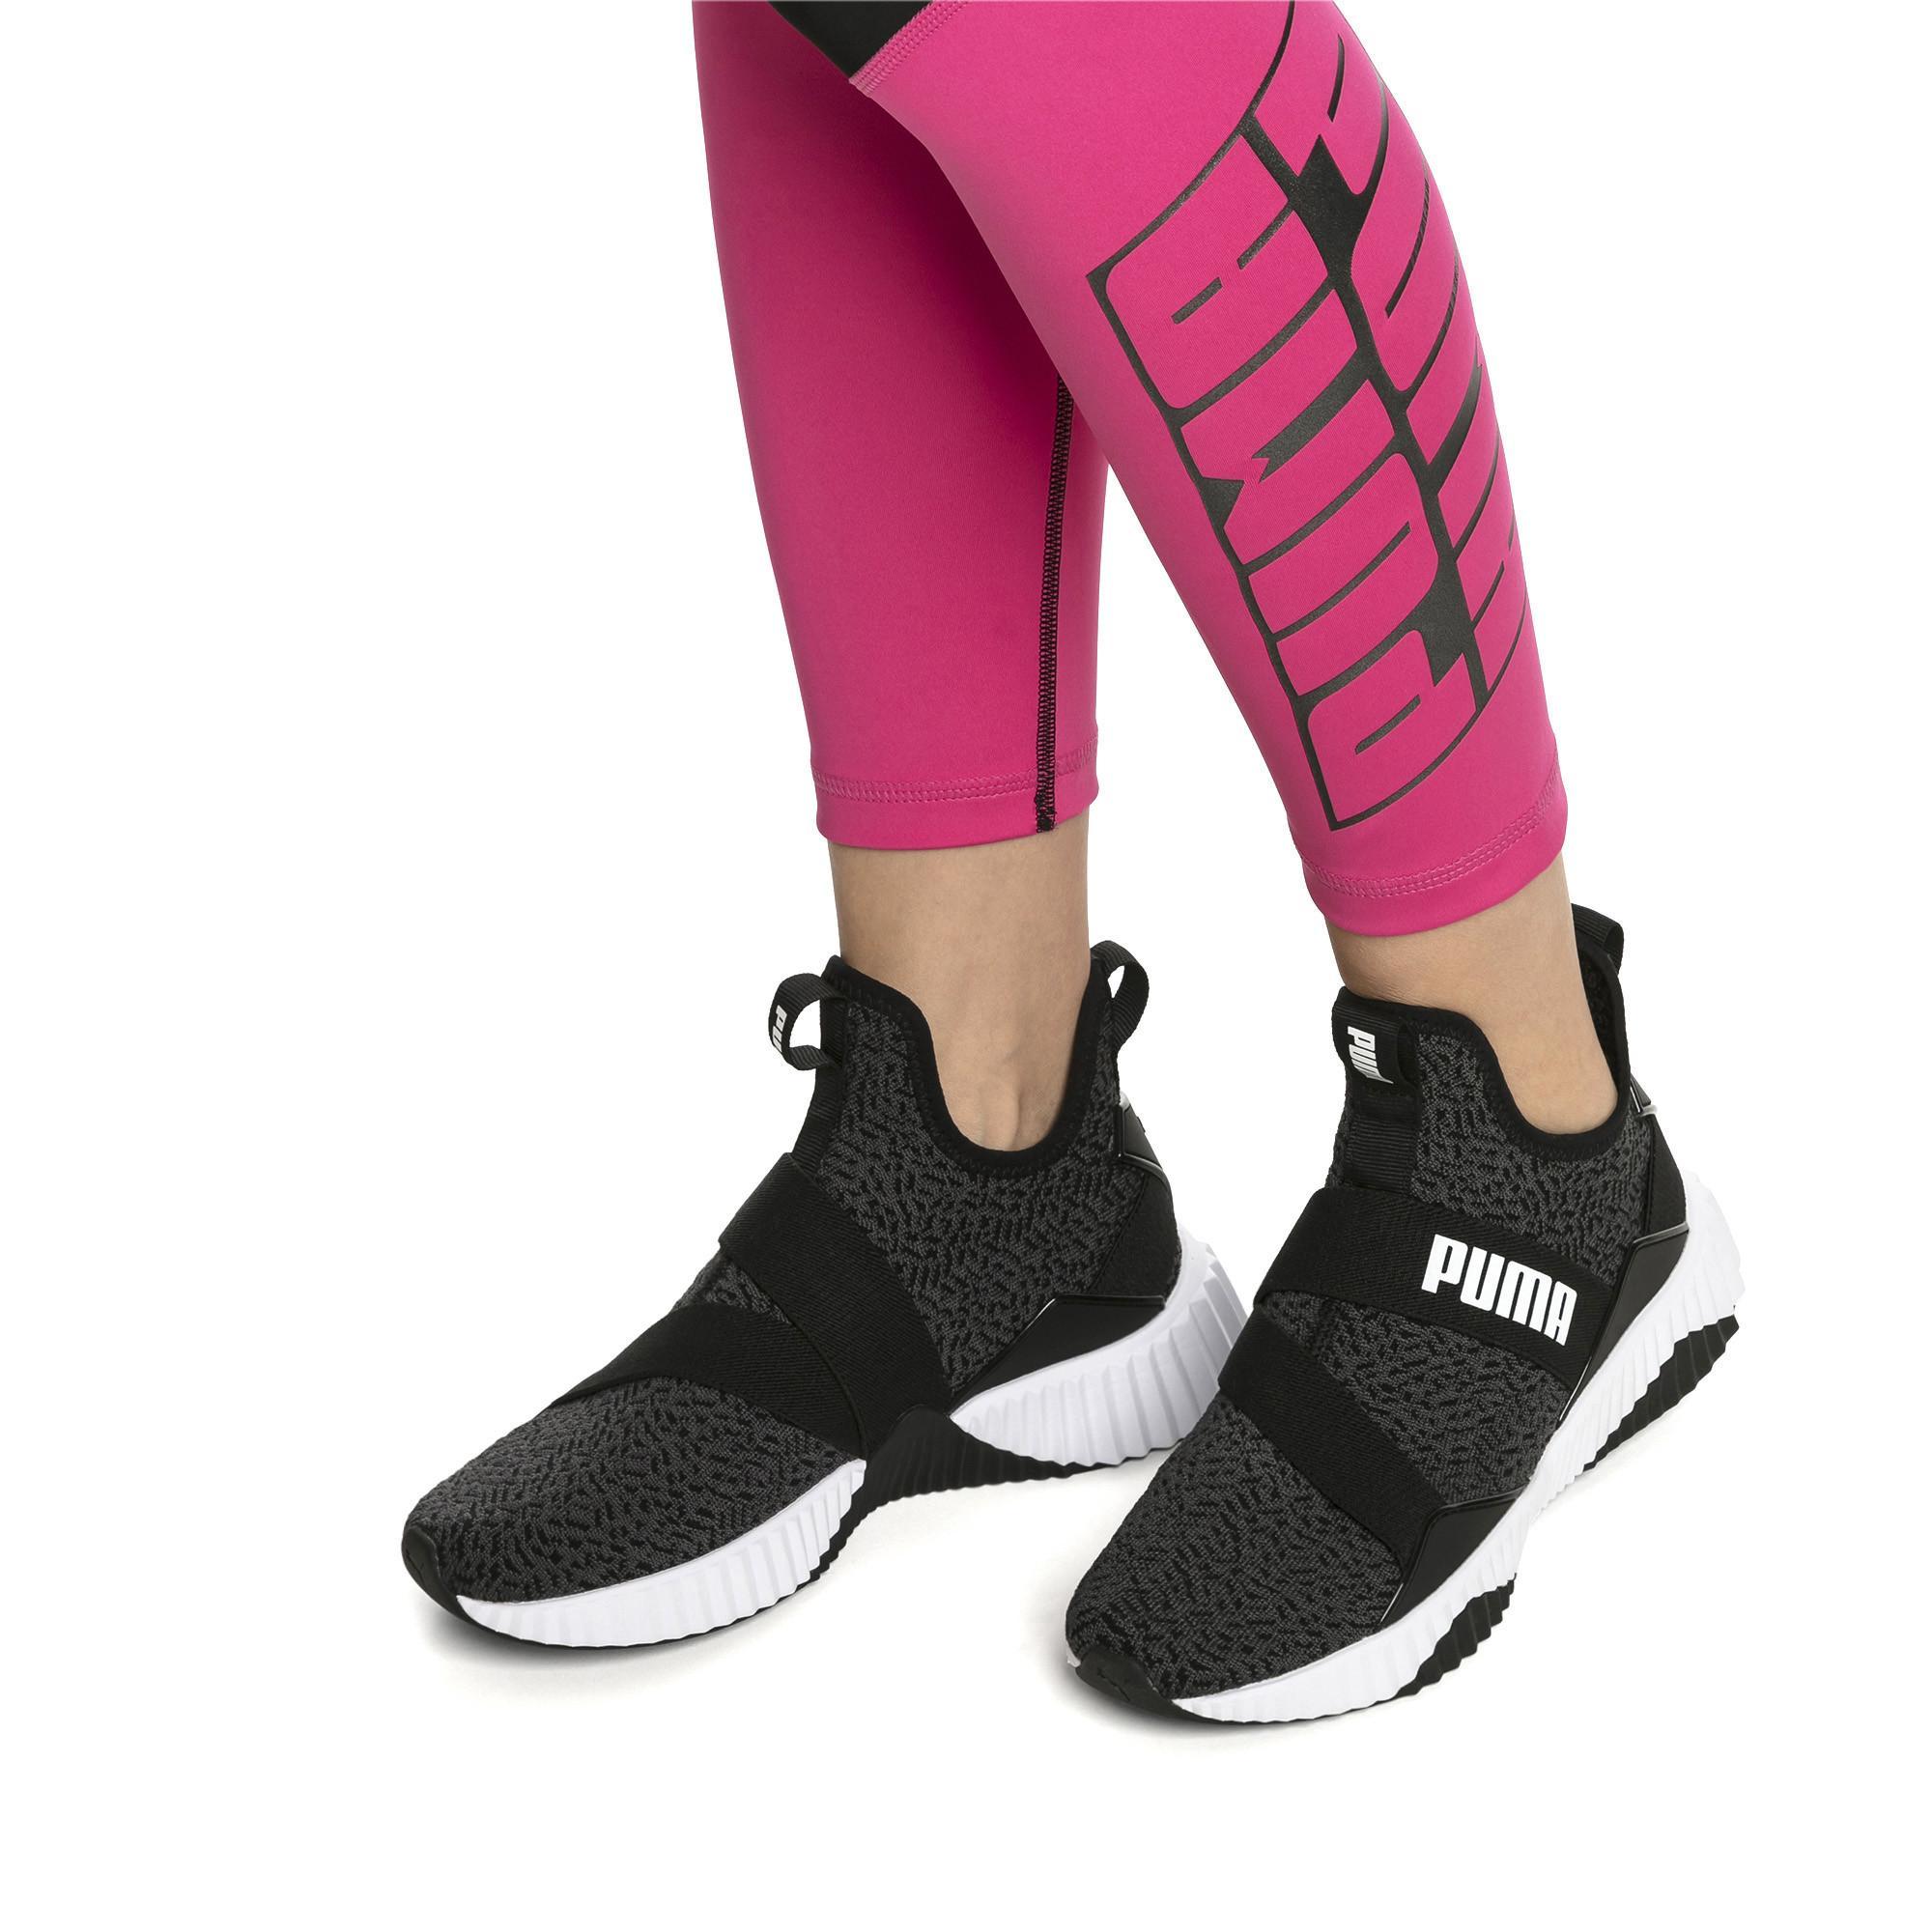 sneakers defy puma